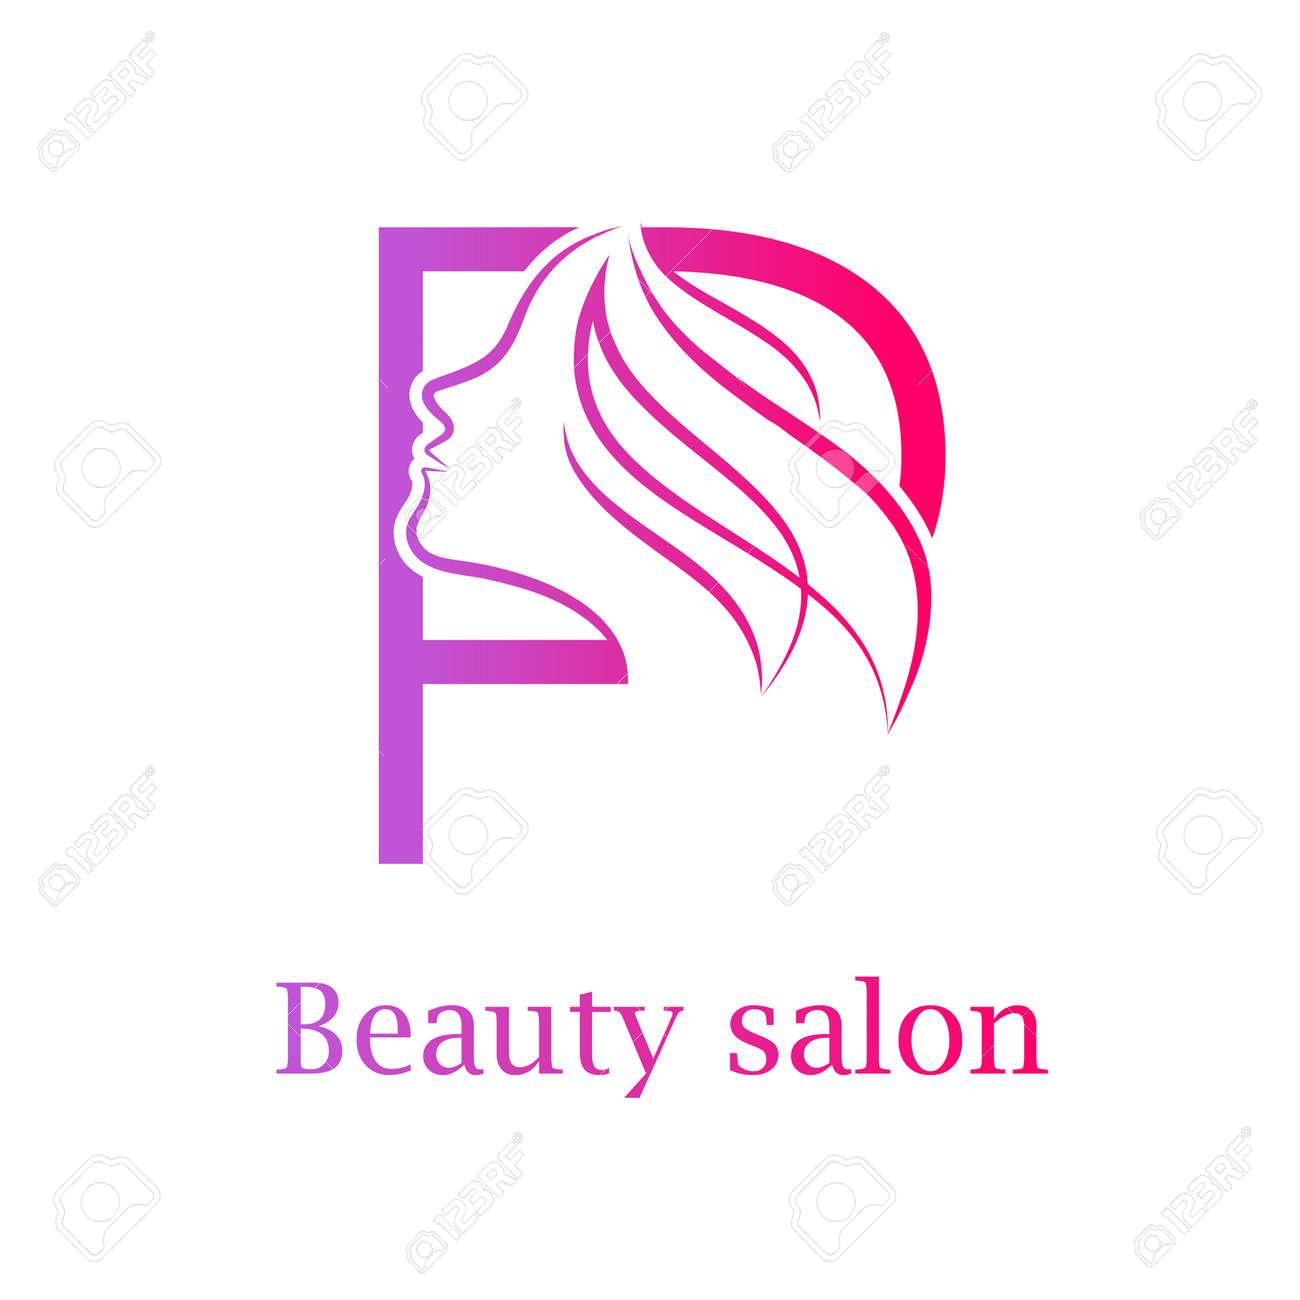 Abstract letter p logobeauty salon logo design template royalty abstract letter p logobeauty salon logo design template stock vector 84733909 altavistaventures Images